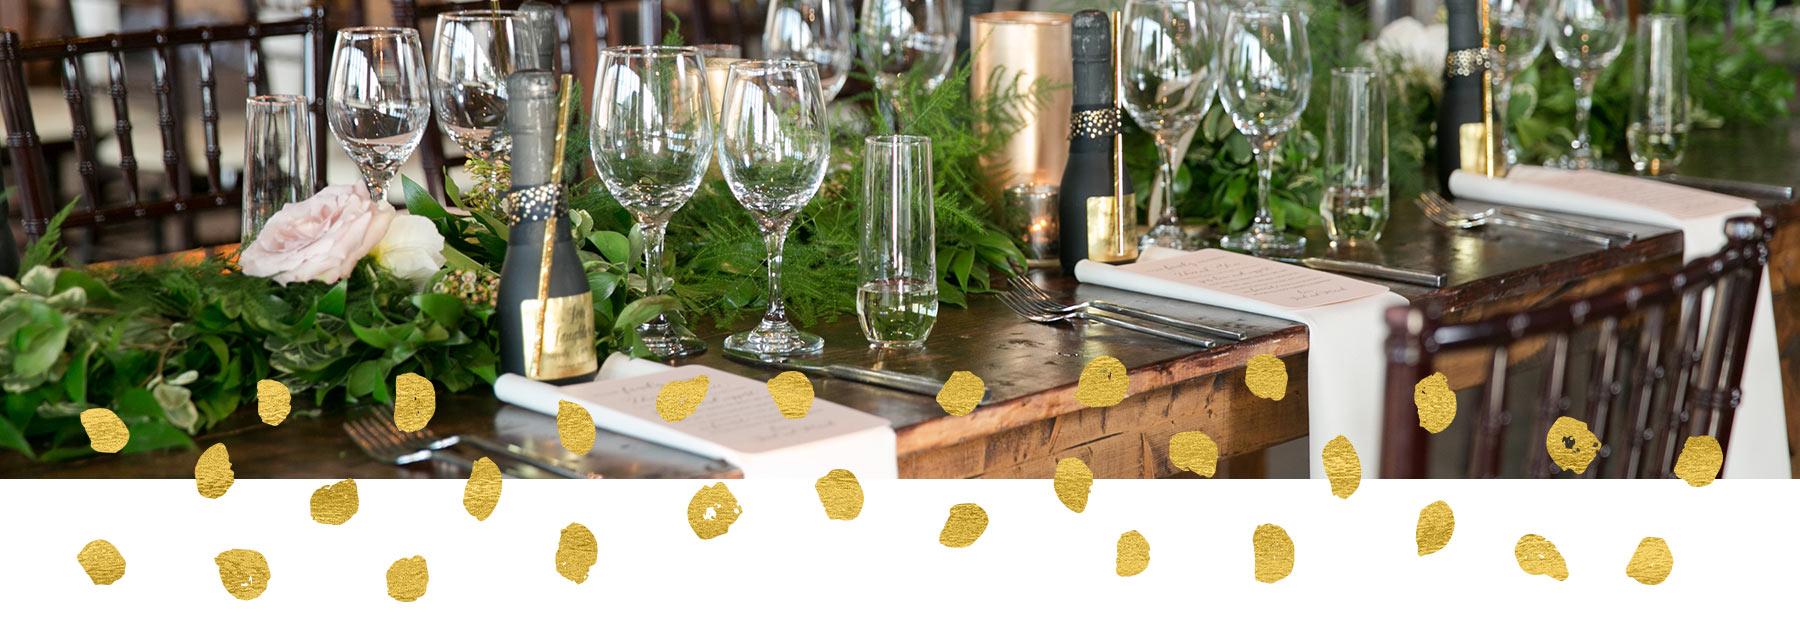 table-setting-gold-dots.jpg